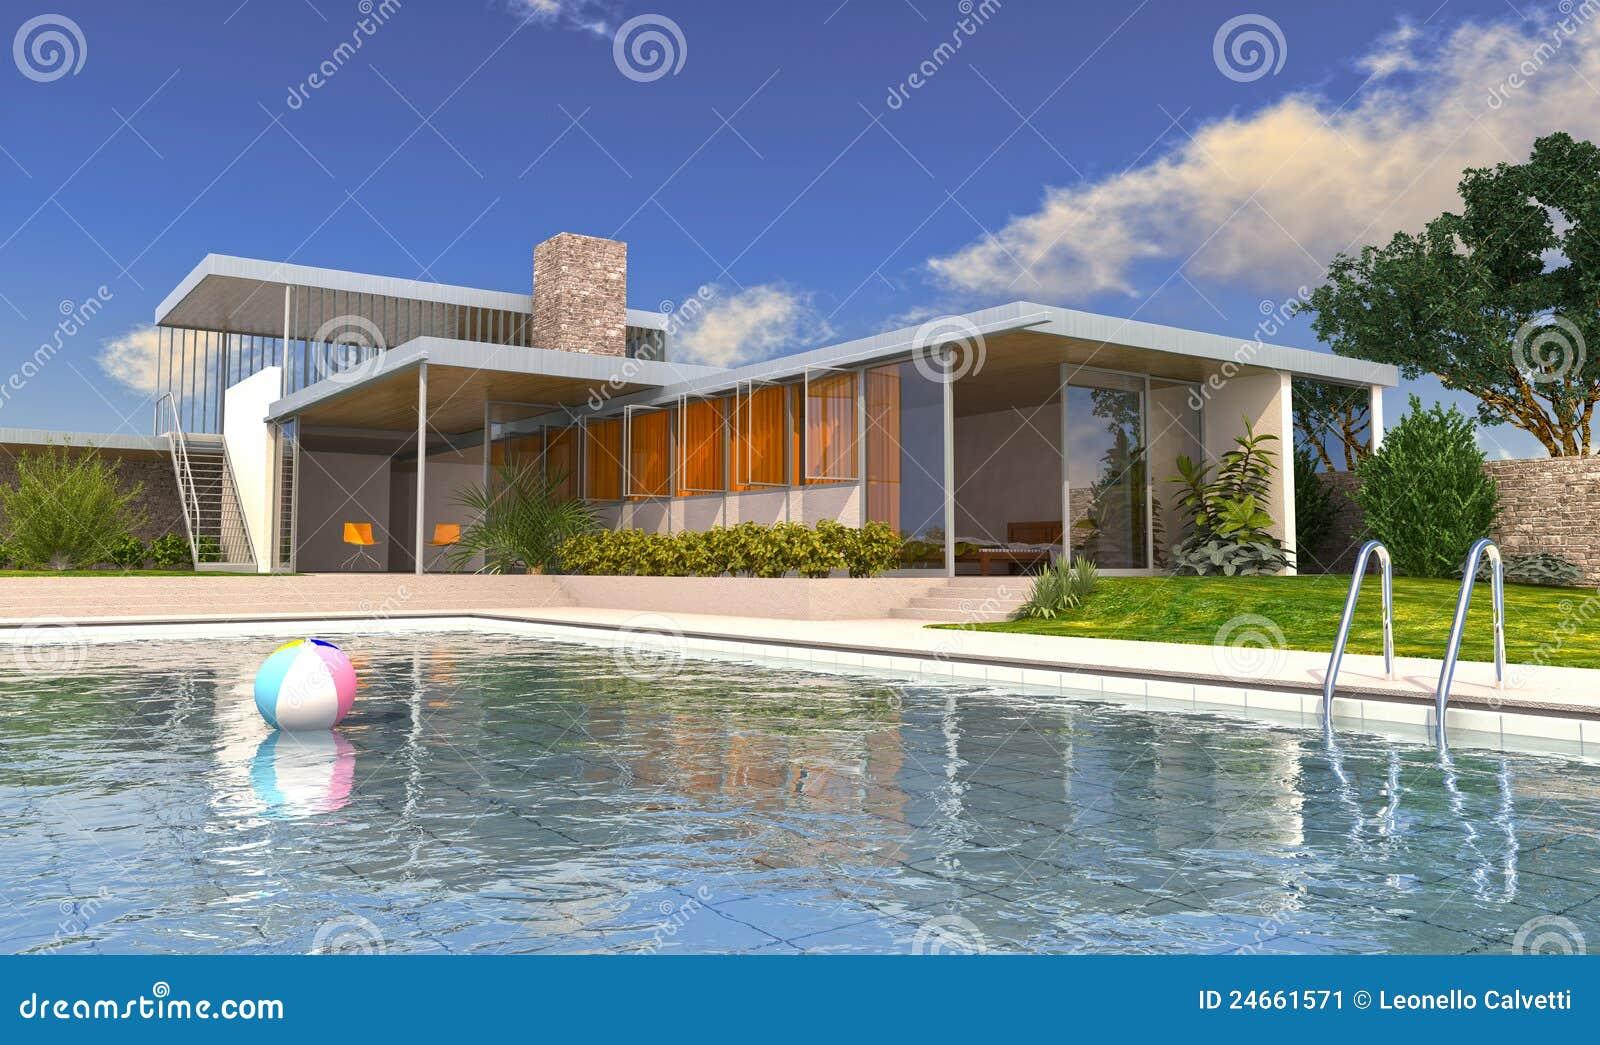 Casa de campo luxuosa moderna com piscina imagem de stock - Cemento para piscinas ...